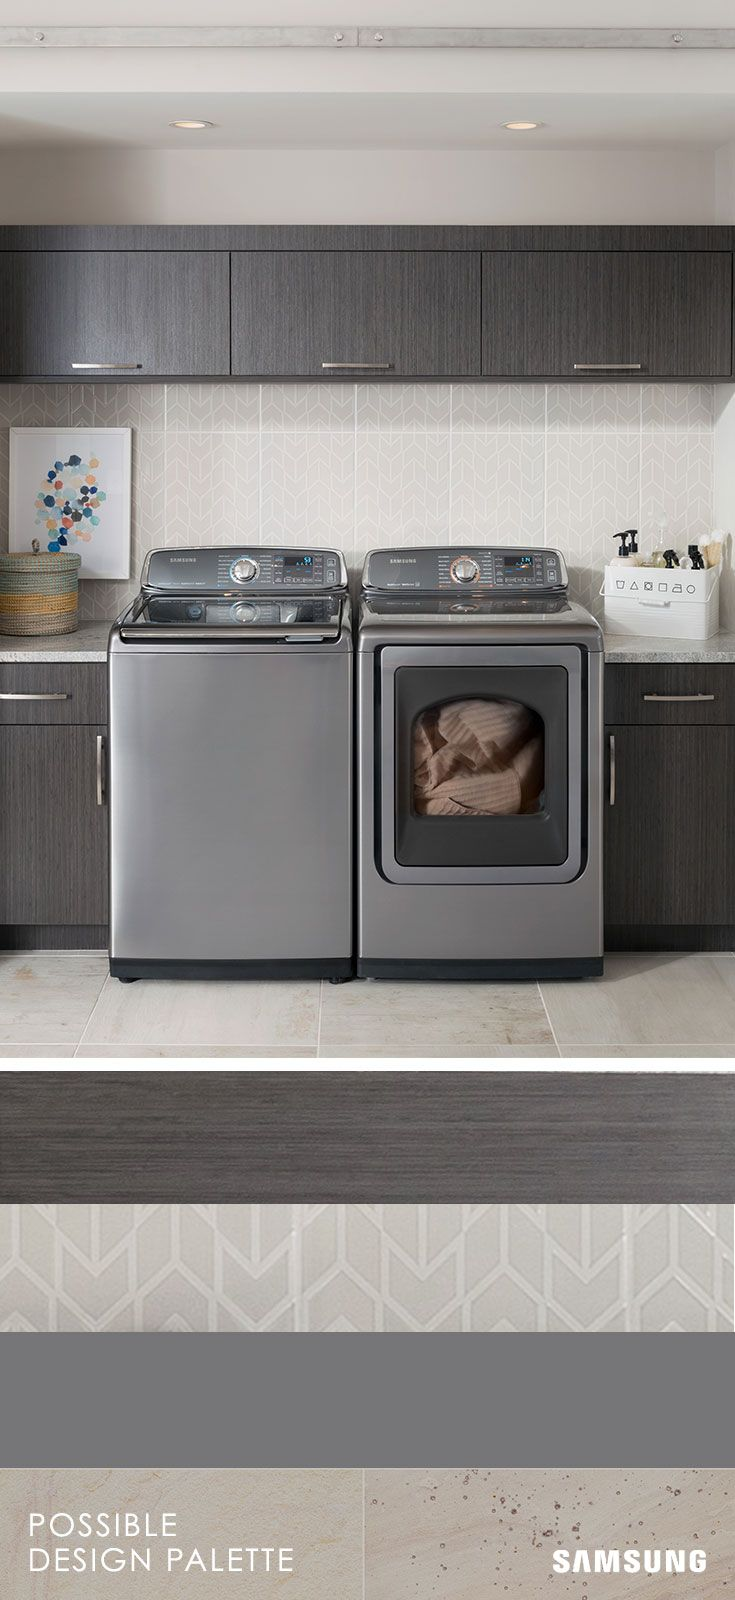 Electric Kitchen Appliances List 17 Best Images About Samsung Laundry Room Design On Pinterest